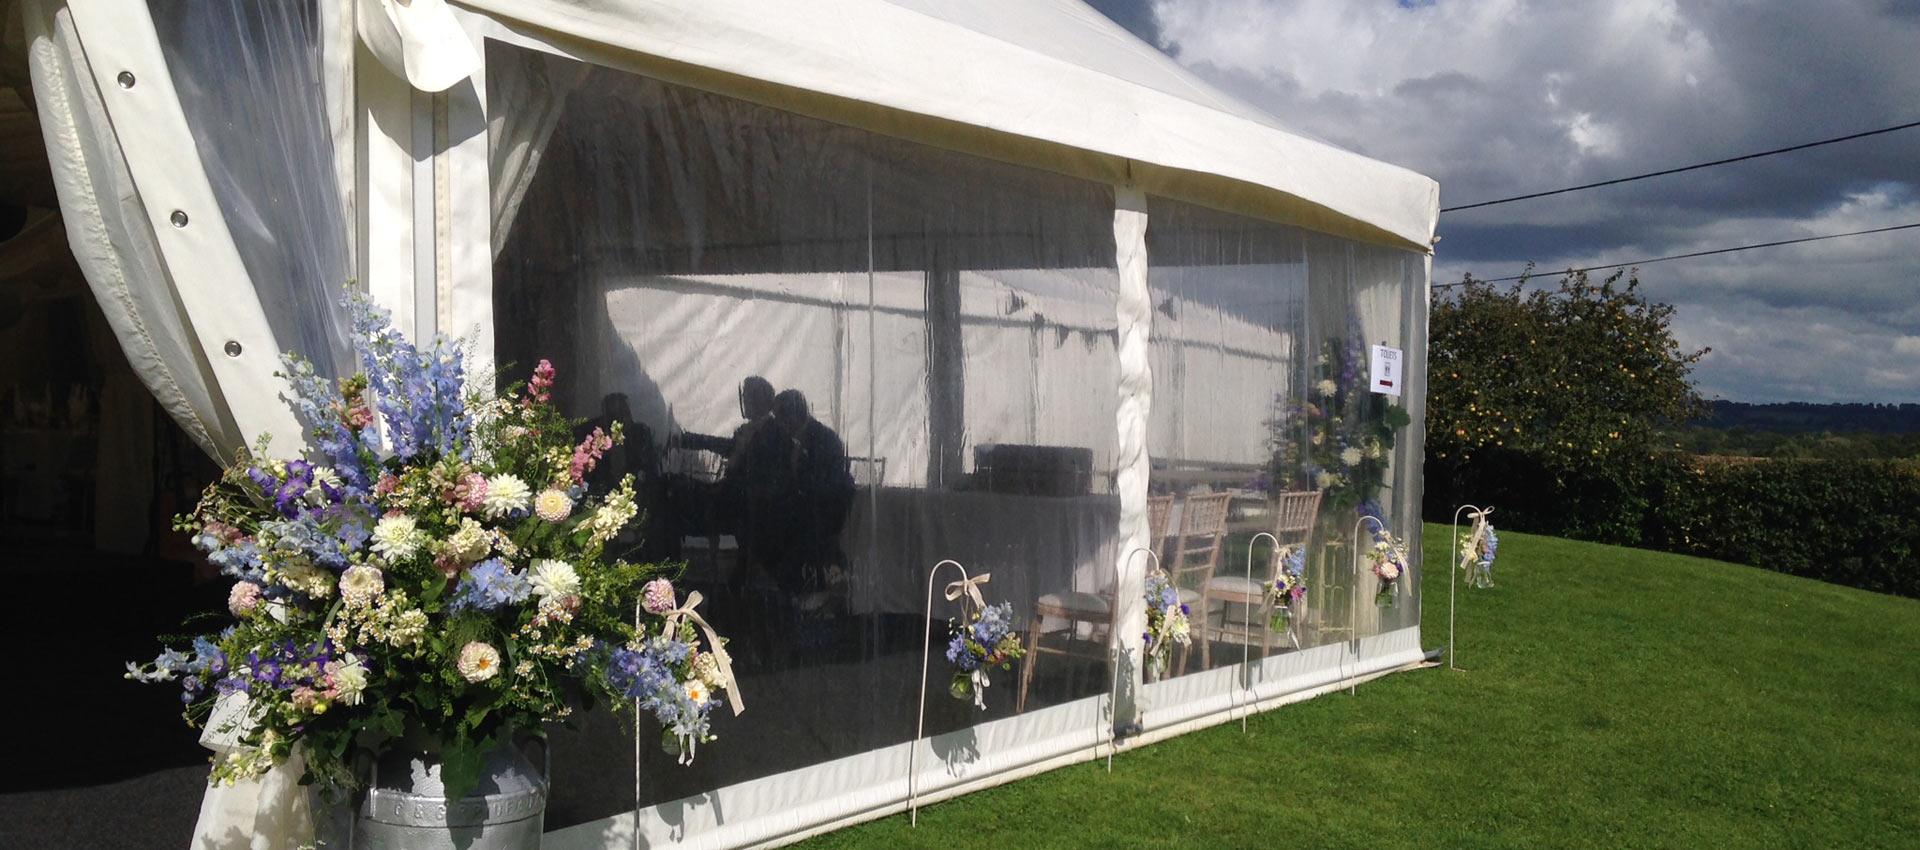 Summer-wedding-marquee